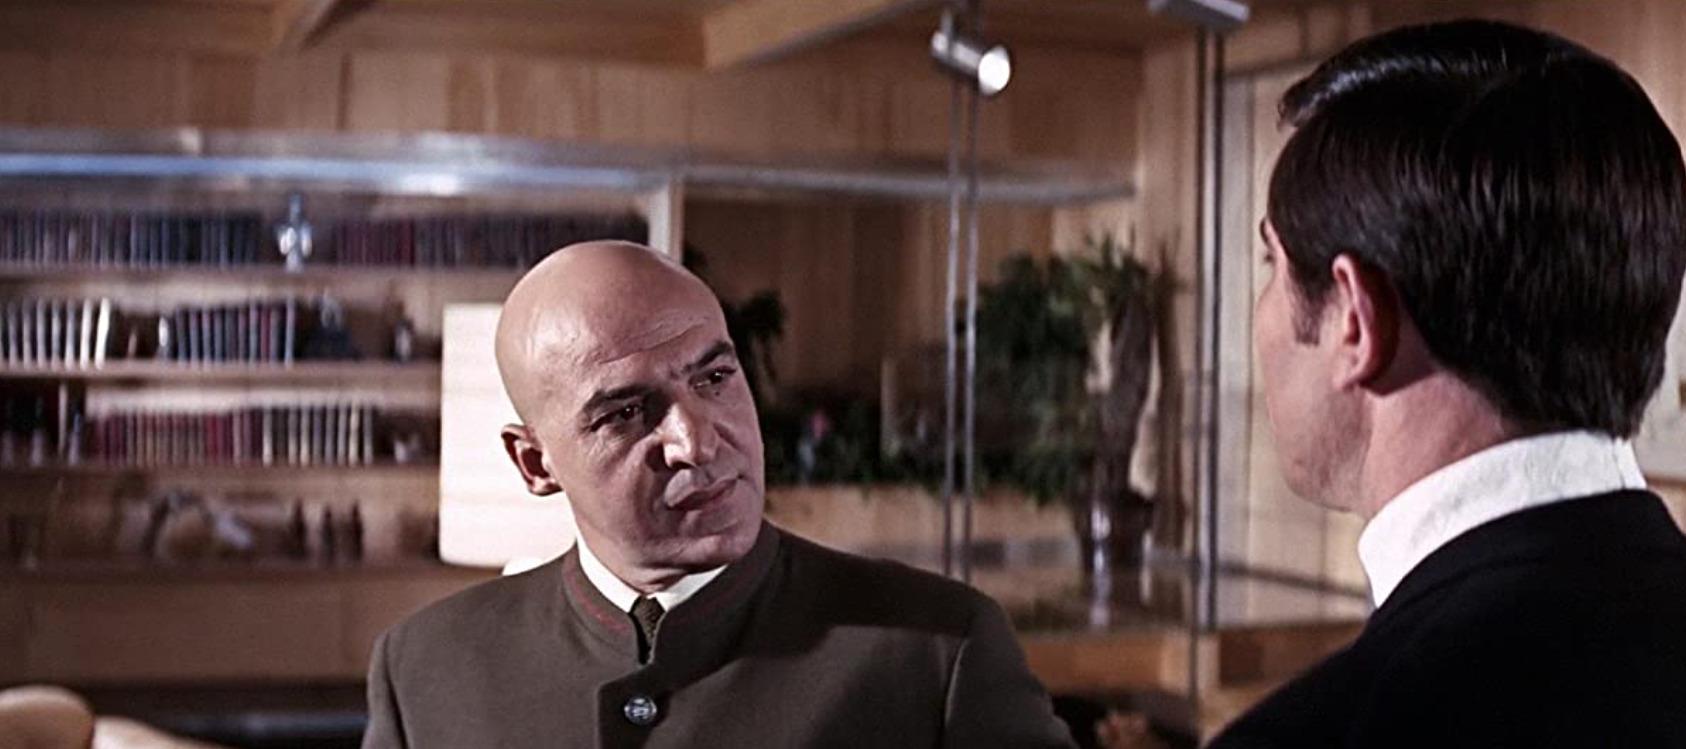 Telly Savalas as Ernst Stavro Blofeld in On Her Majesty's Secret Service